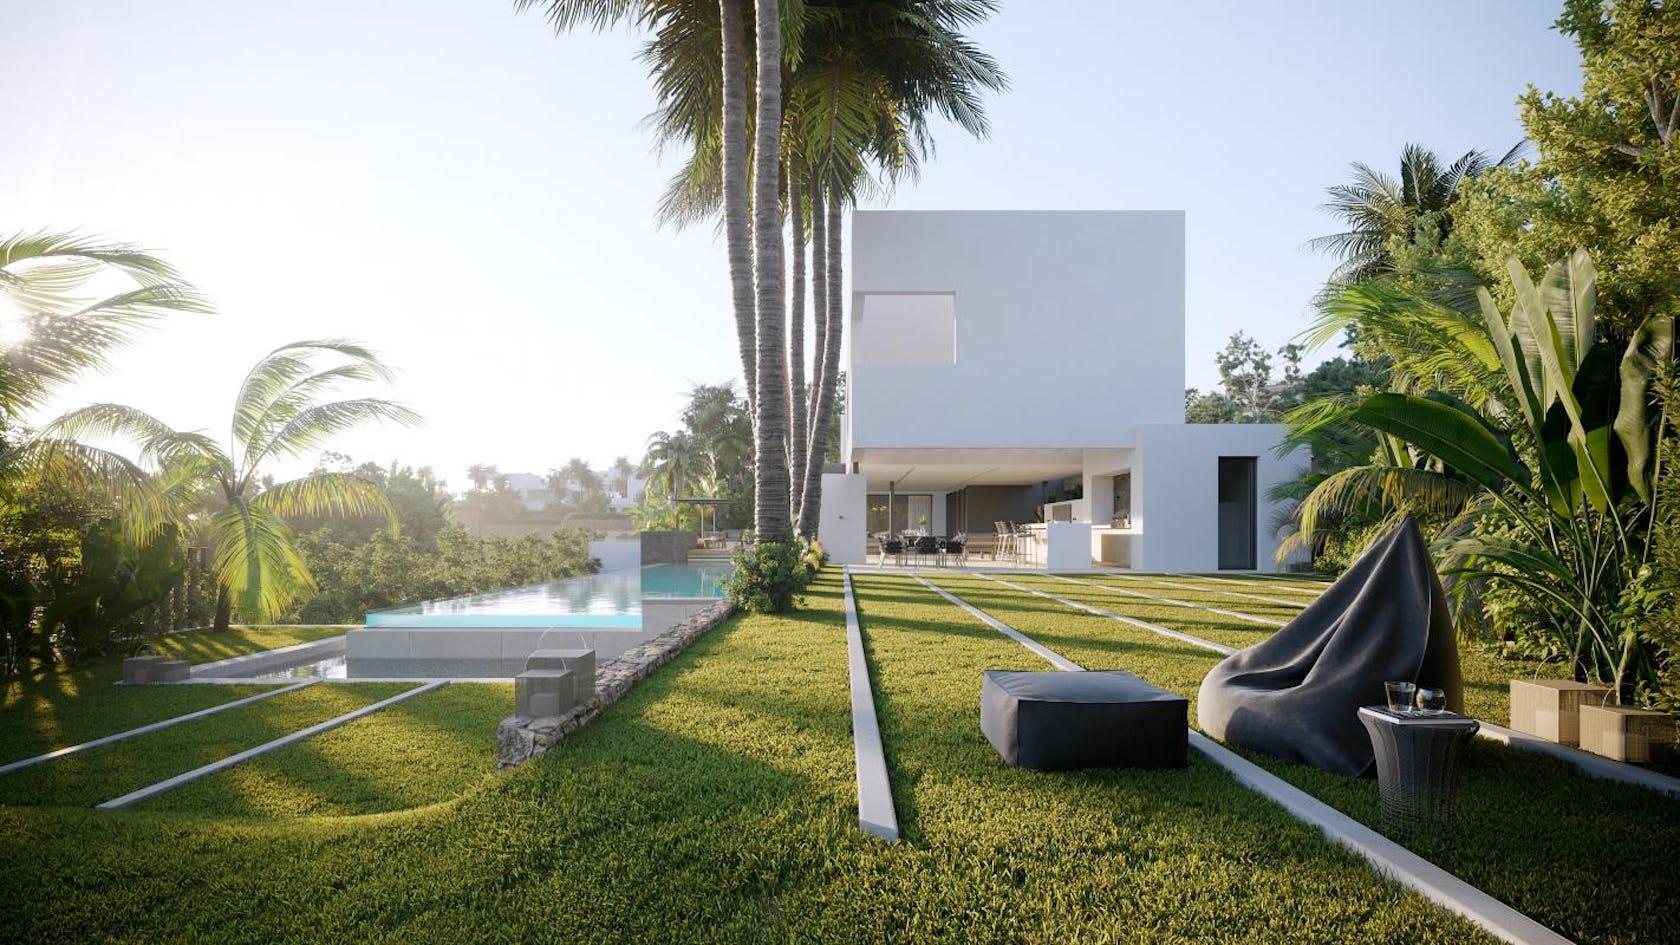 plant grass lawn